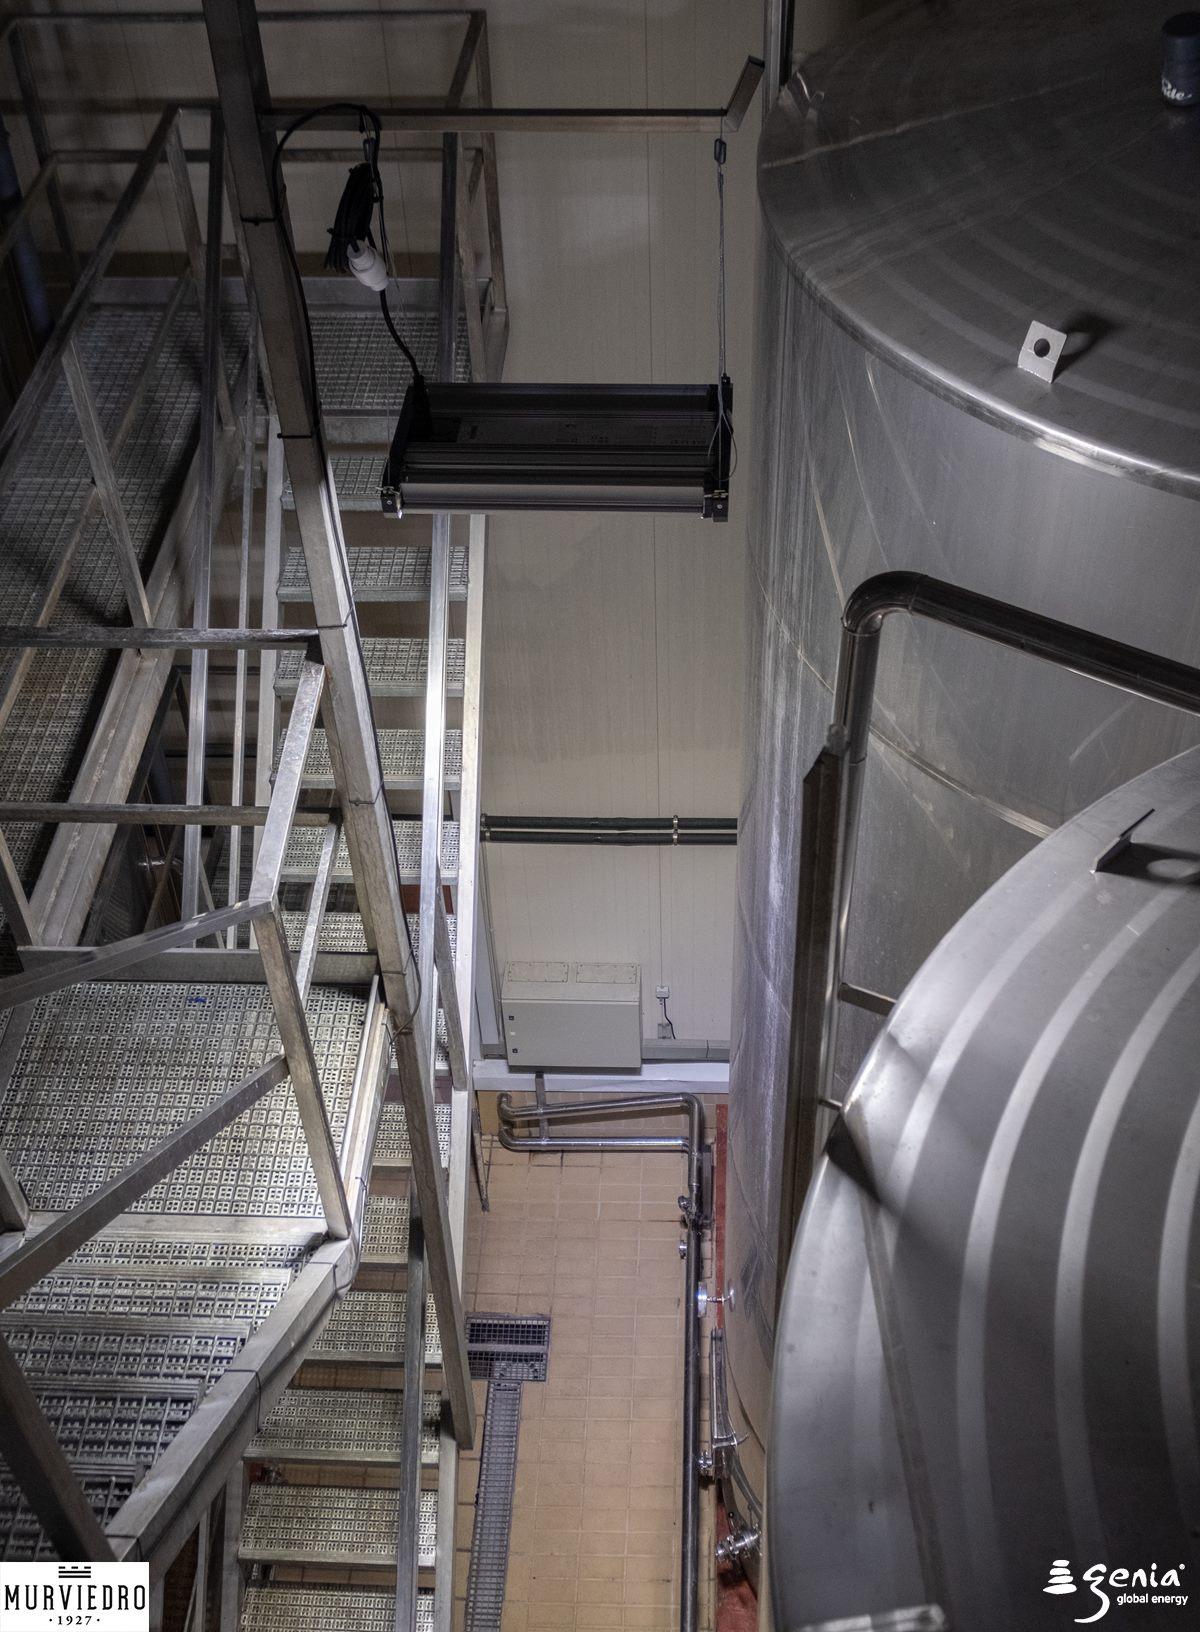 iluminacion-inteligente-industrial-bodegas-murviedro-bodega-e-isobaricas-6